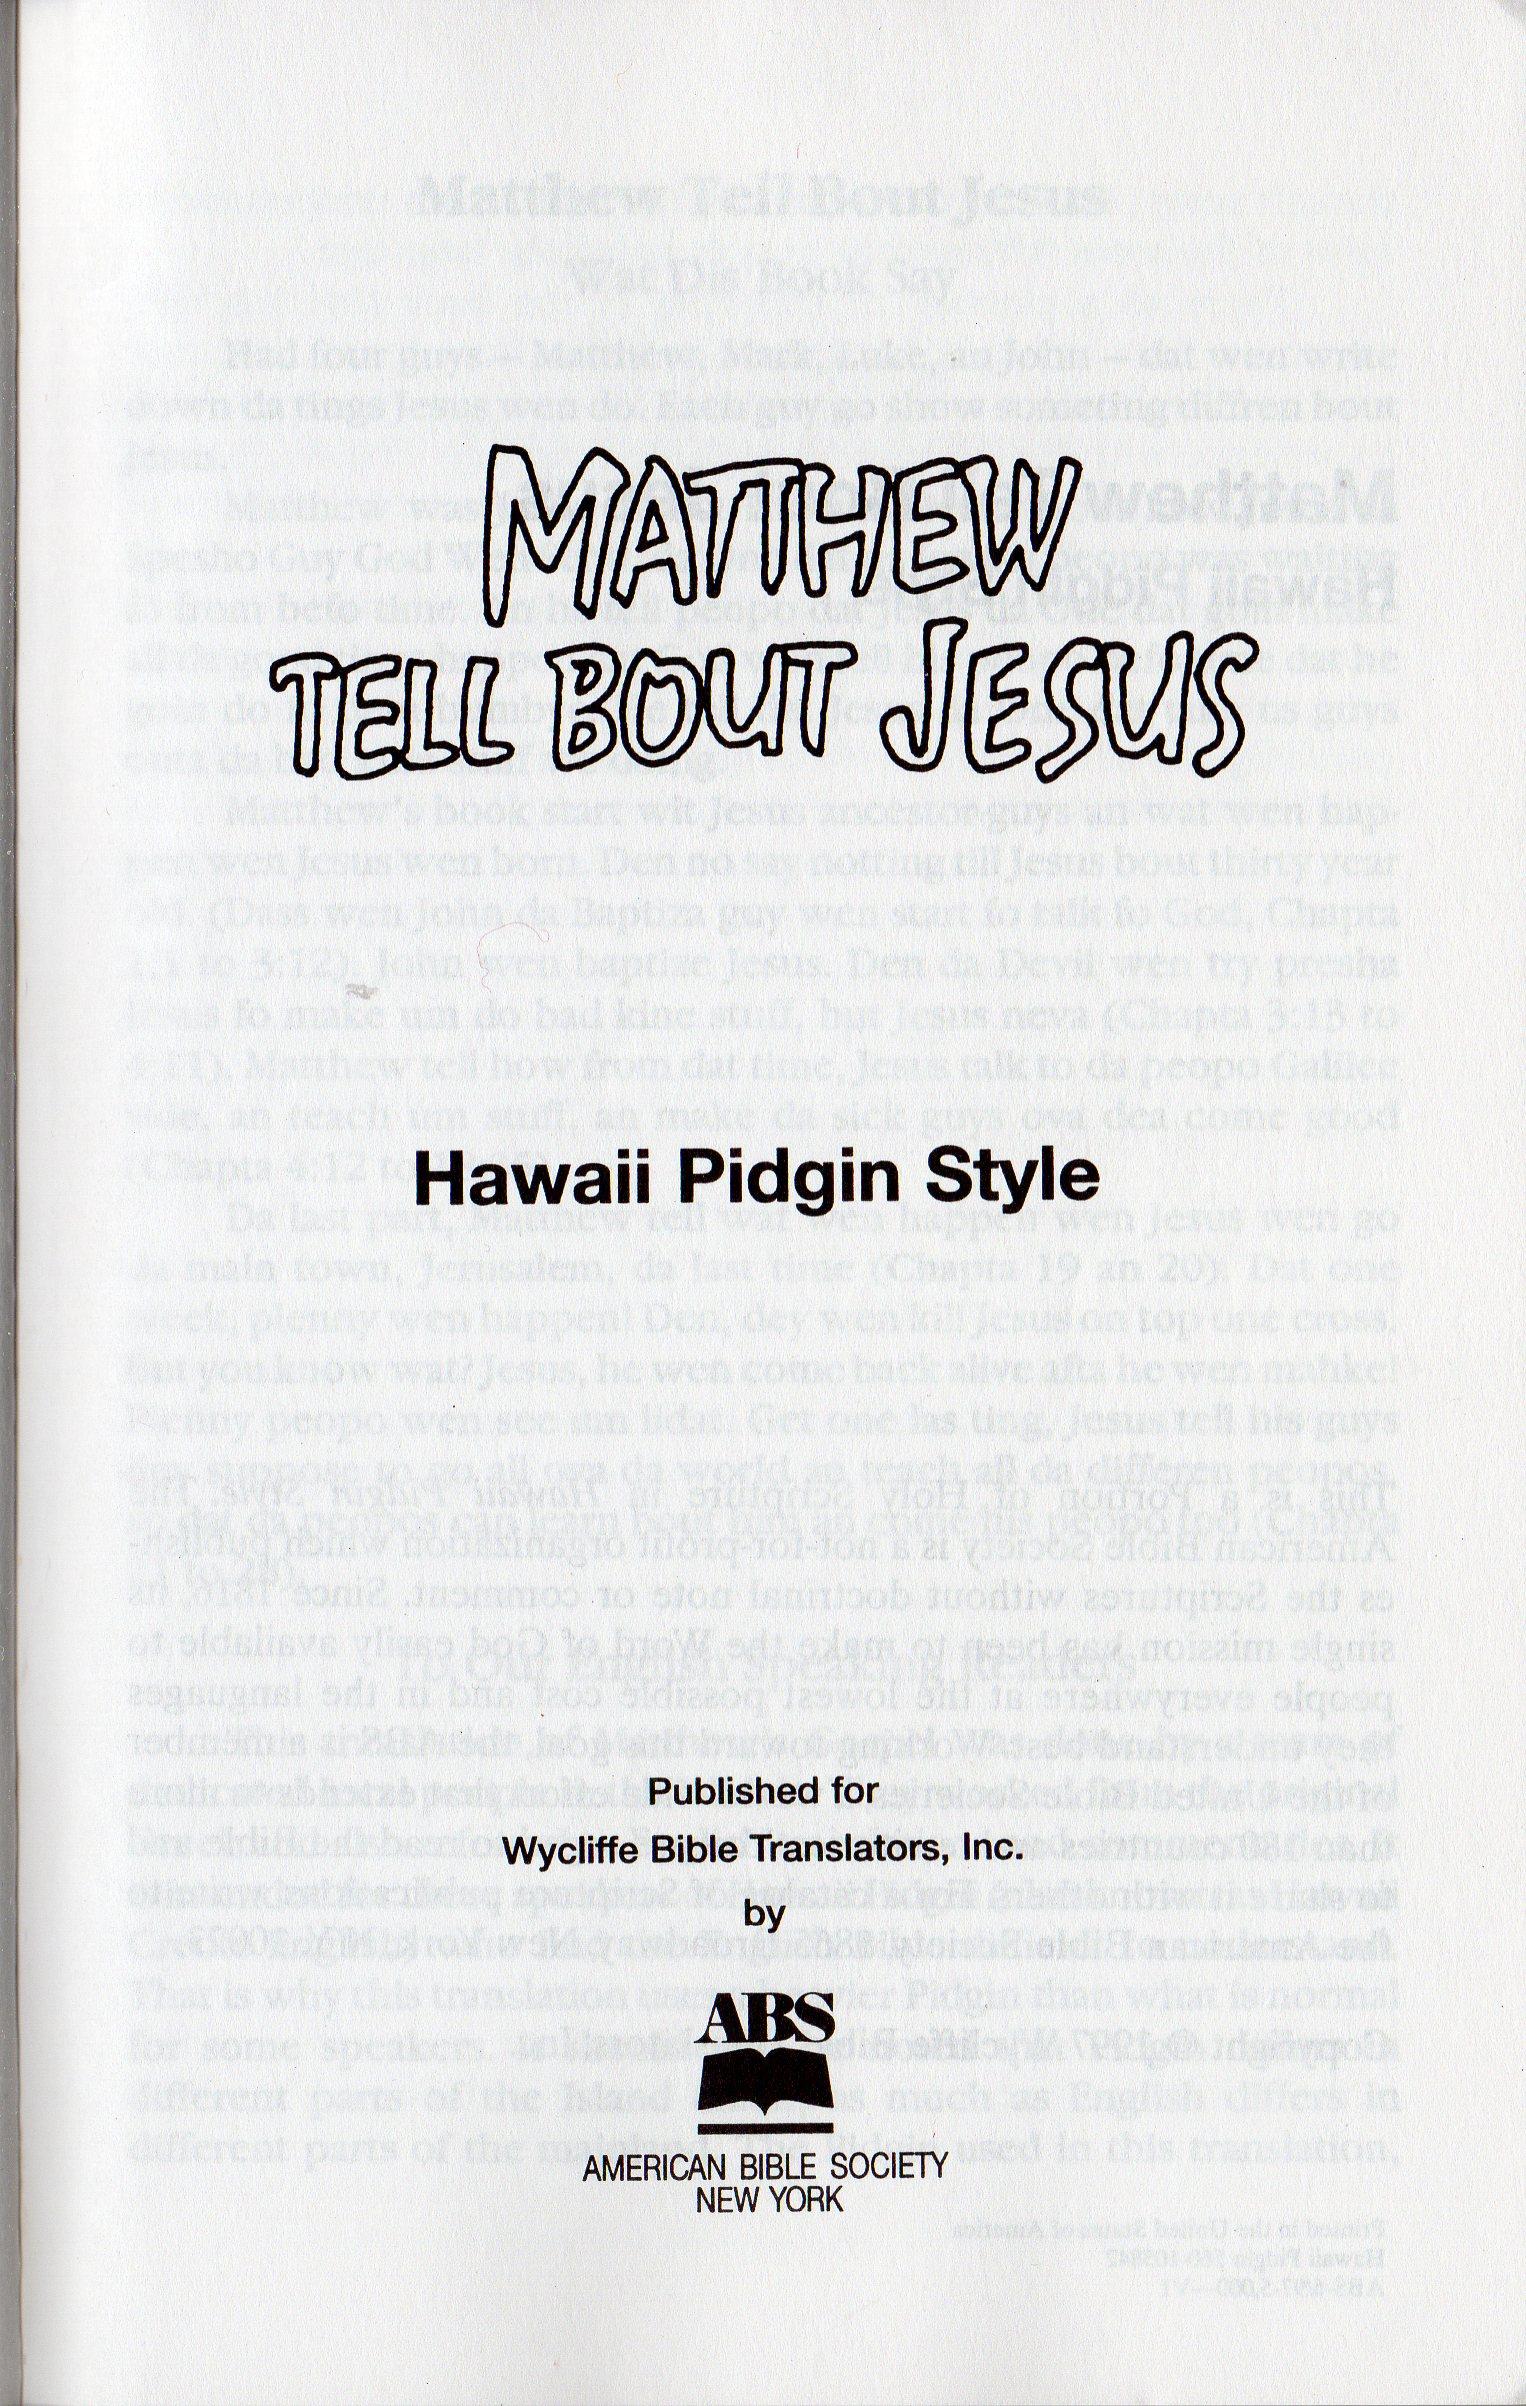 pidginnigerian Language | Just another Hausa.Bible Sites site |Pidgin Bible